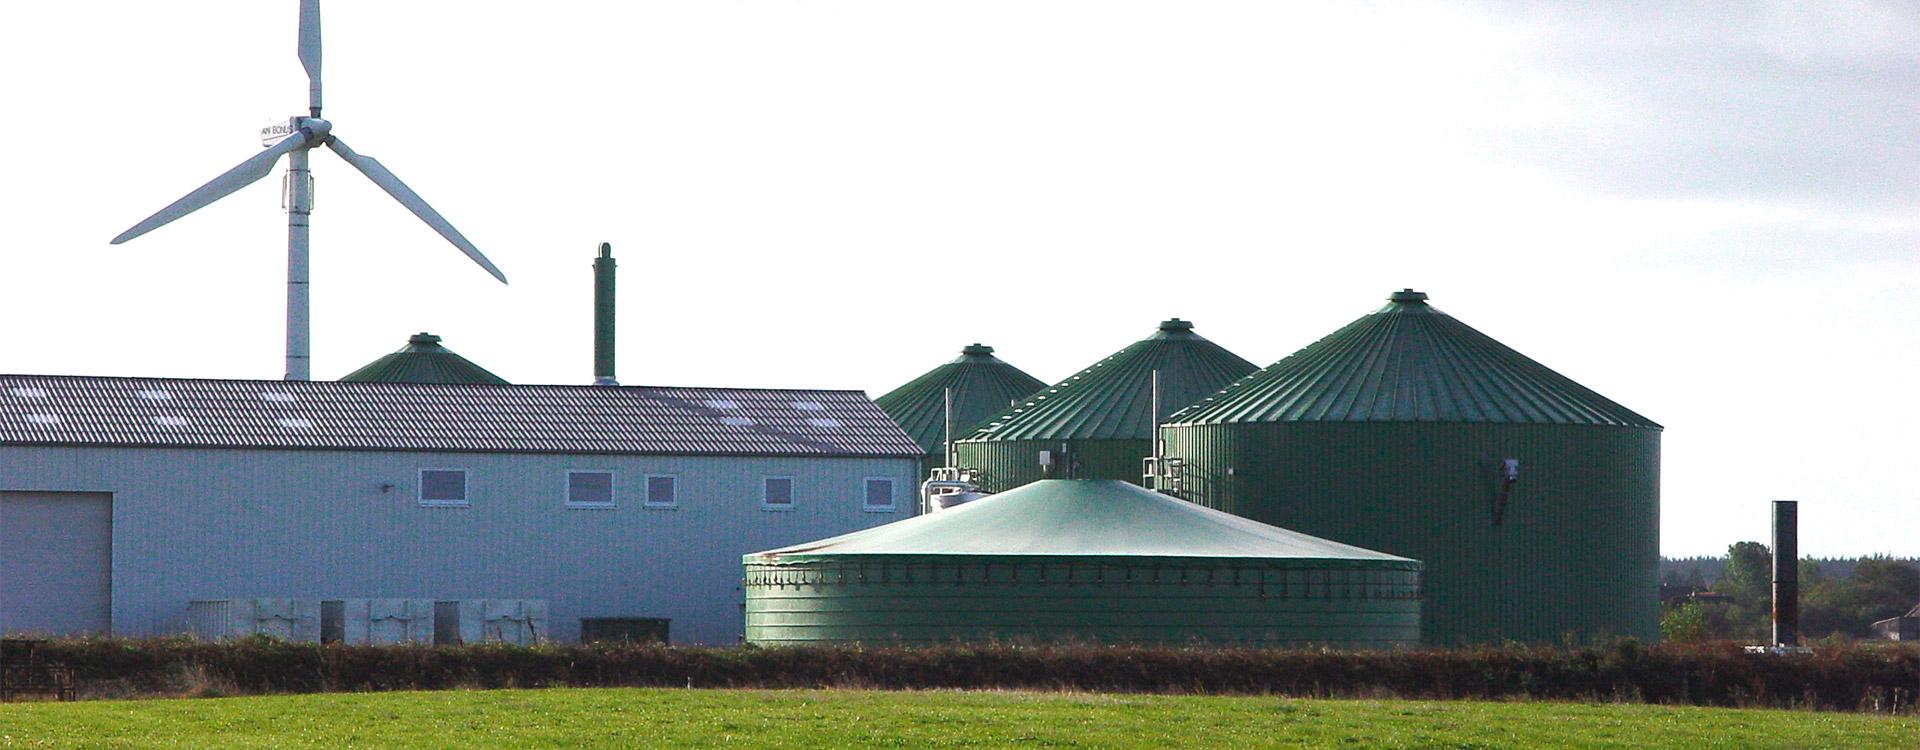 Landwirtschaft Fermentation - Lipp System